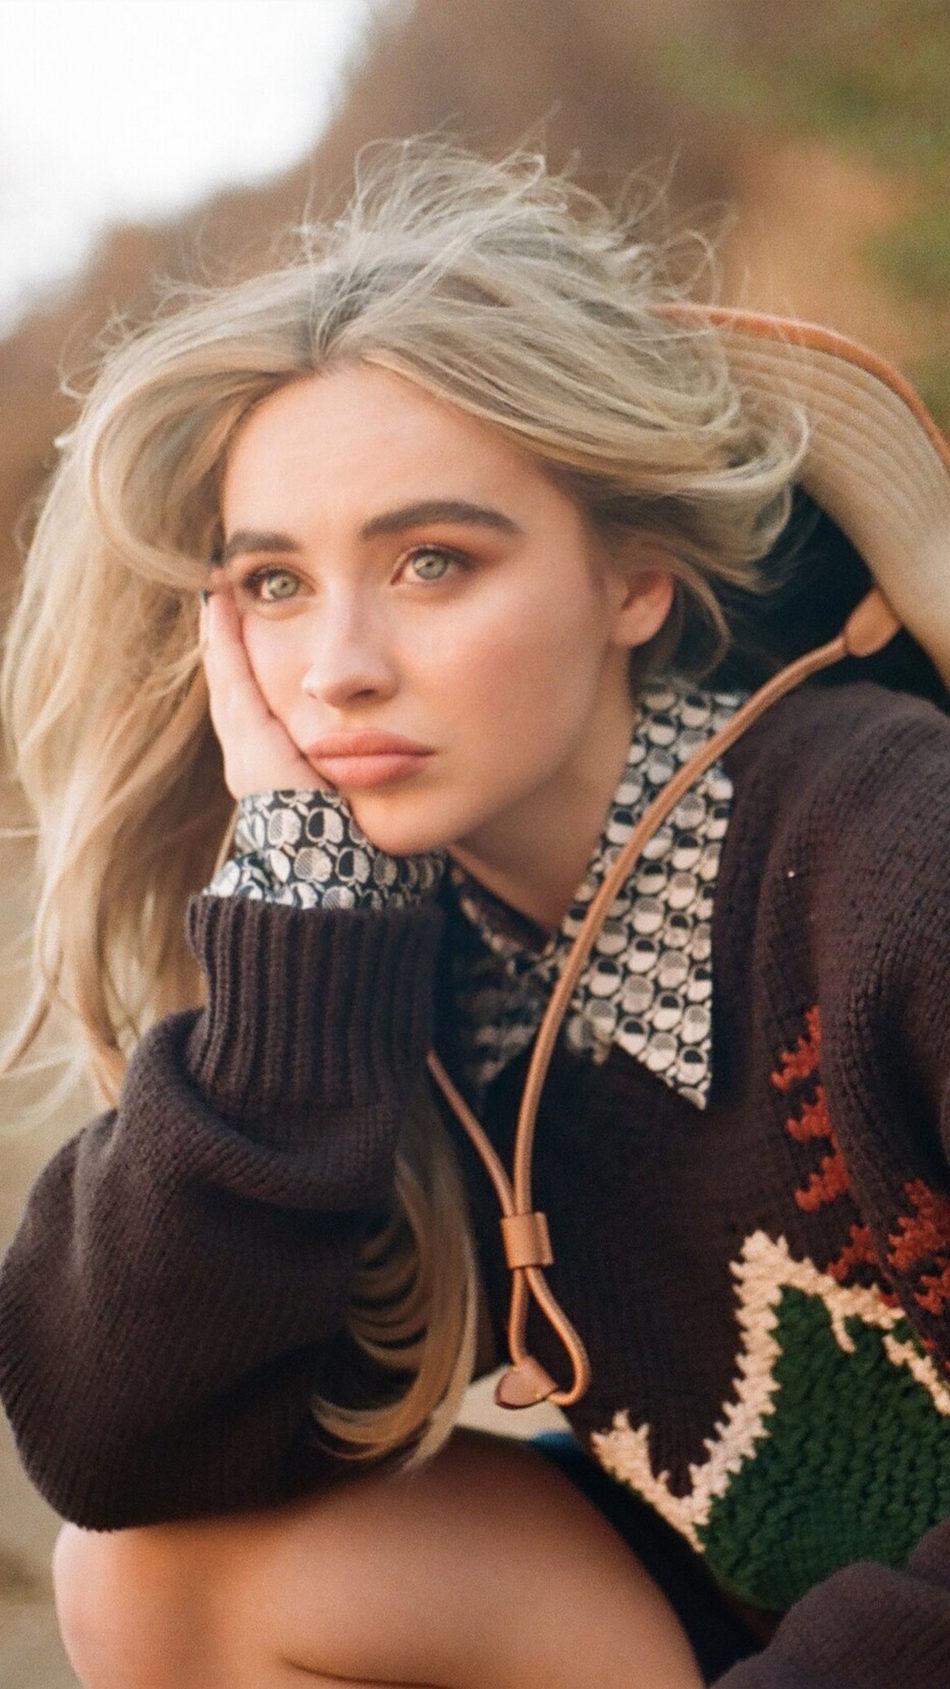 Sabrina Carpenter Photoshoot 2020 4K Ultra HD Mobile Wallpaper